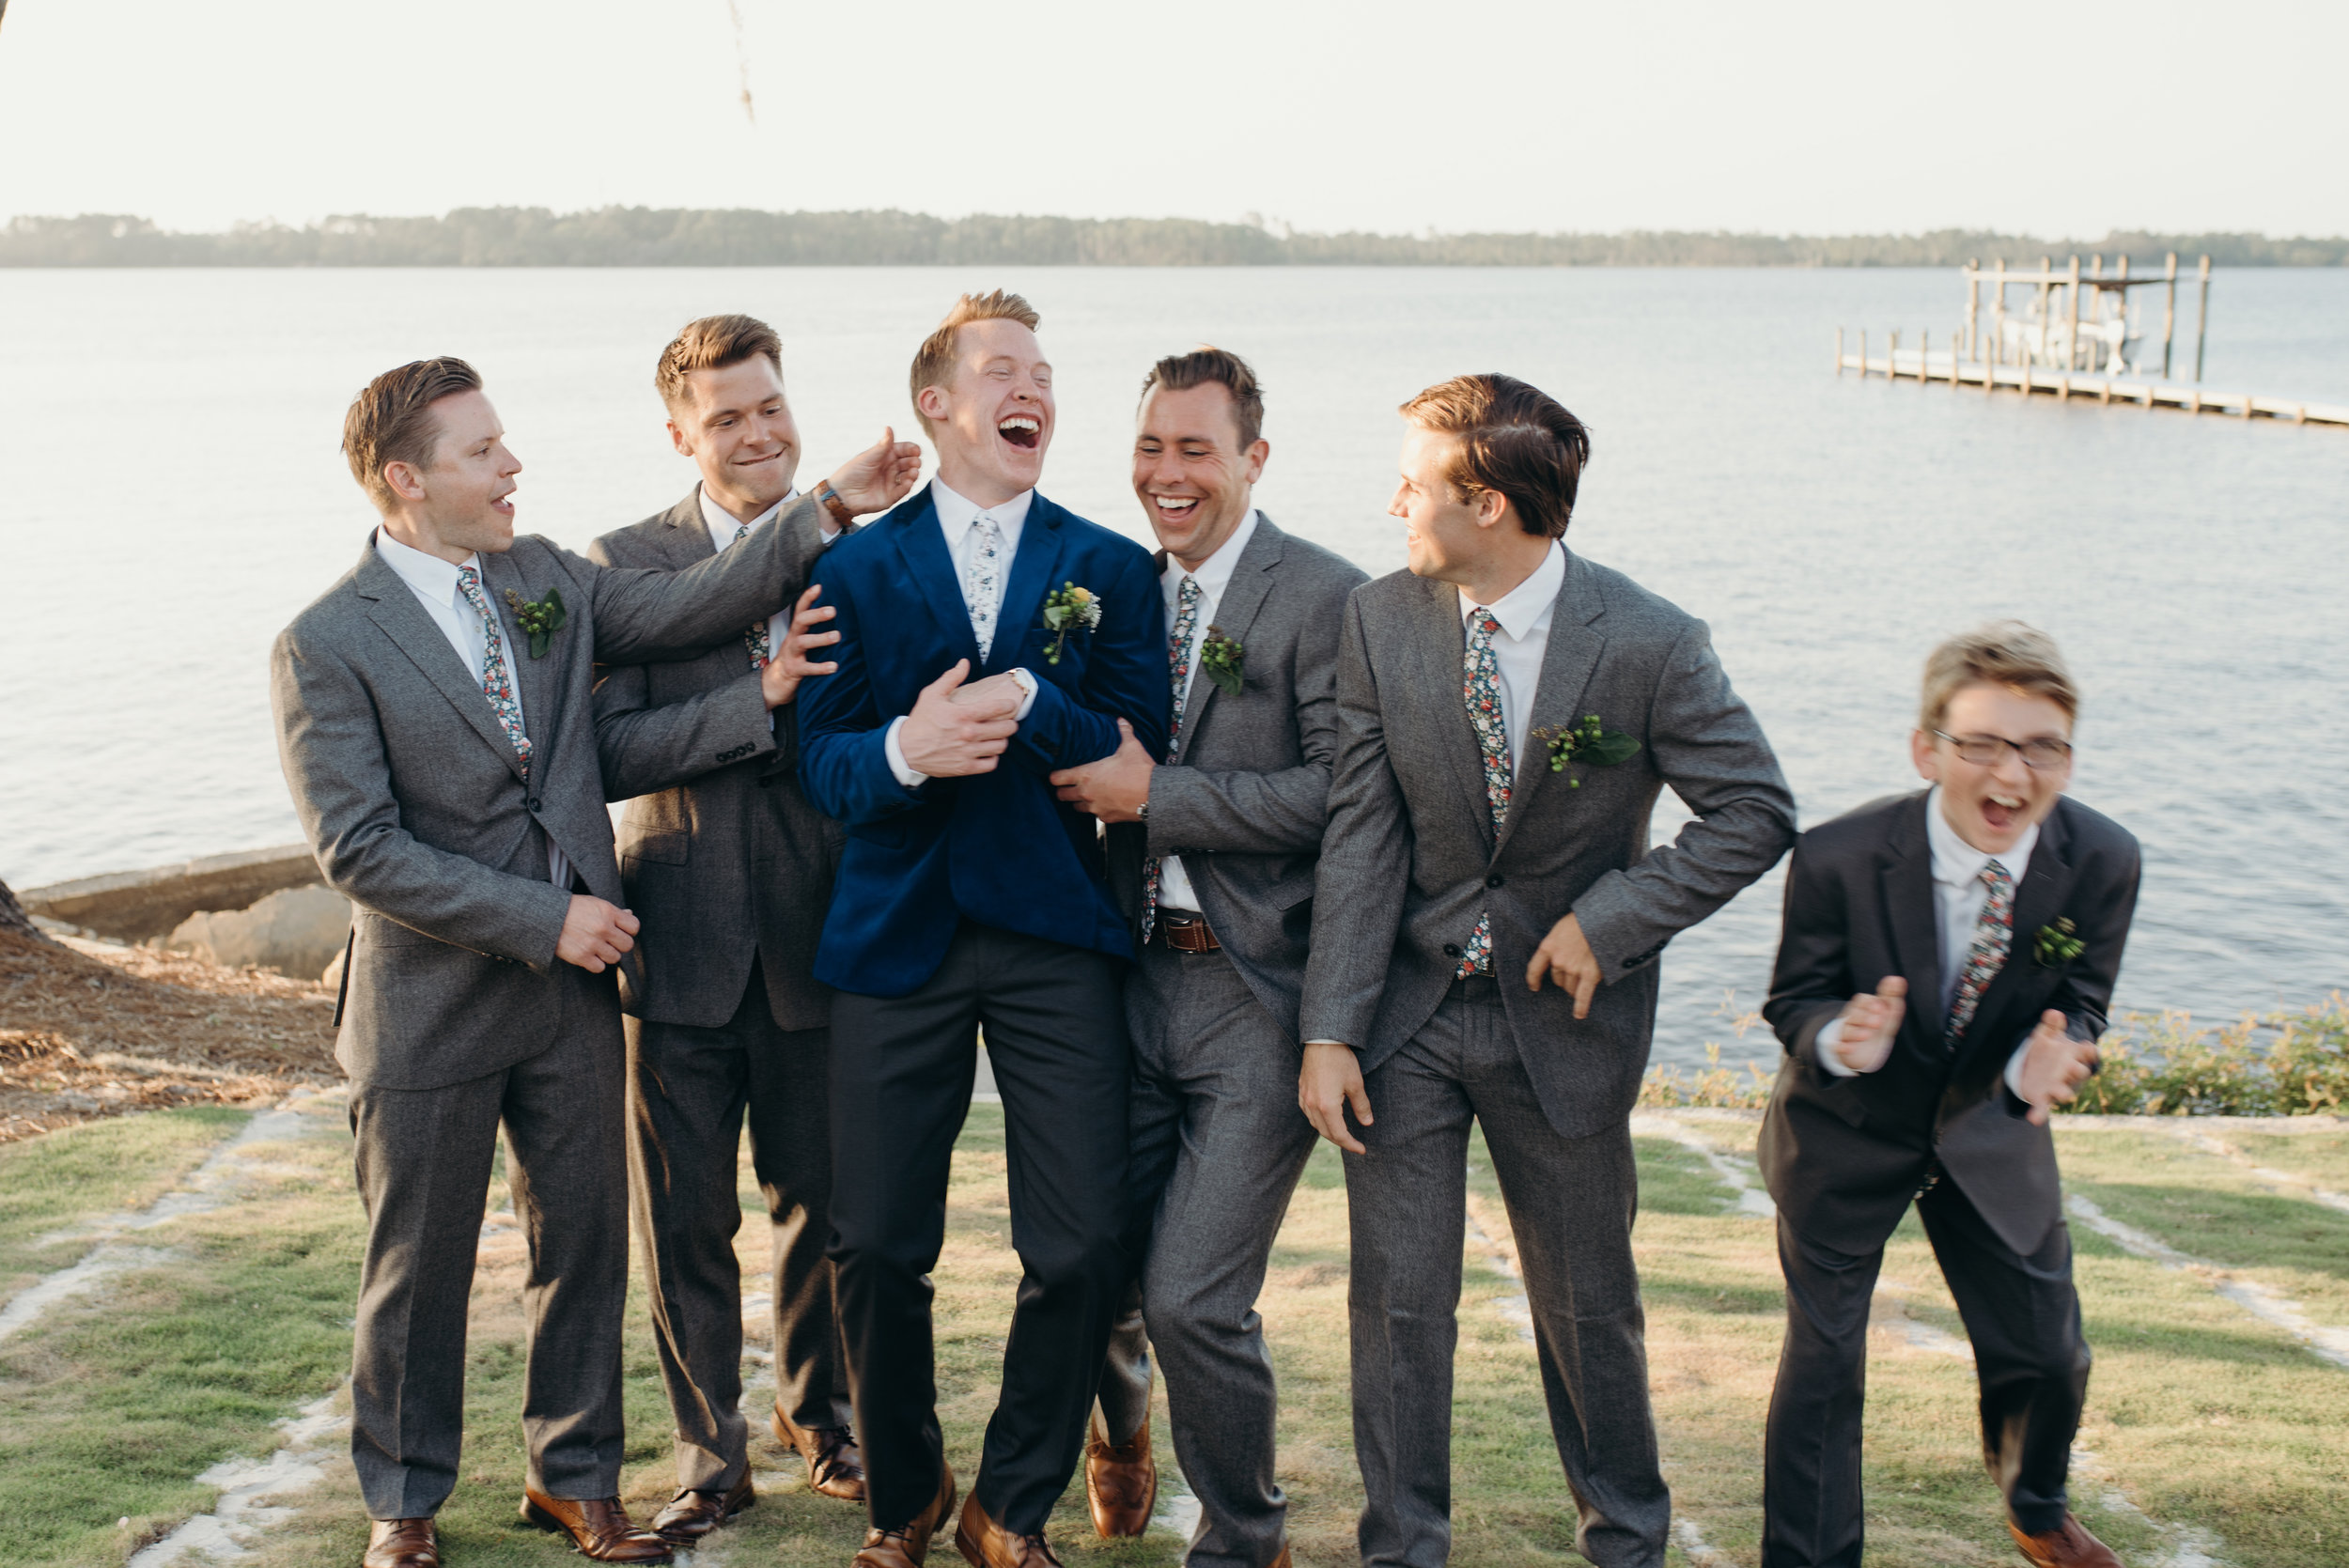 zayda-collin-panama-city-wedding-photography-trippy-bohemian-lisa-frank-wedding-group-shots-34.jpg